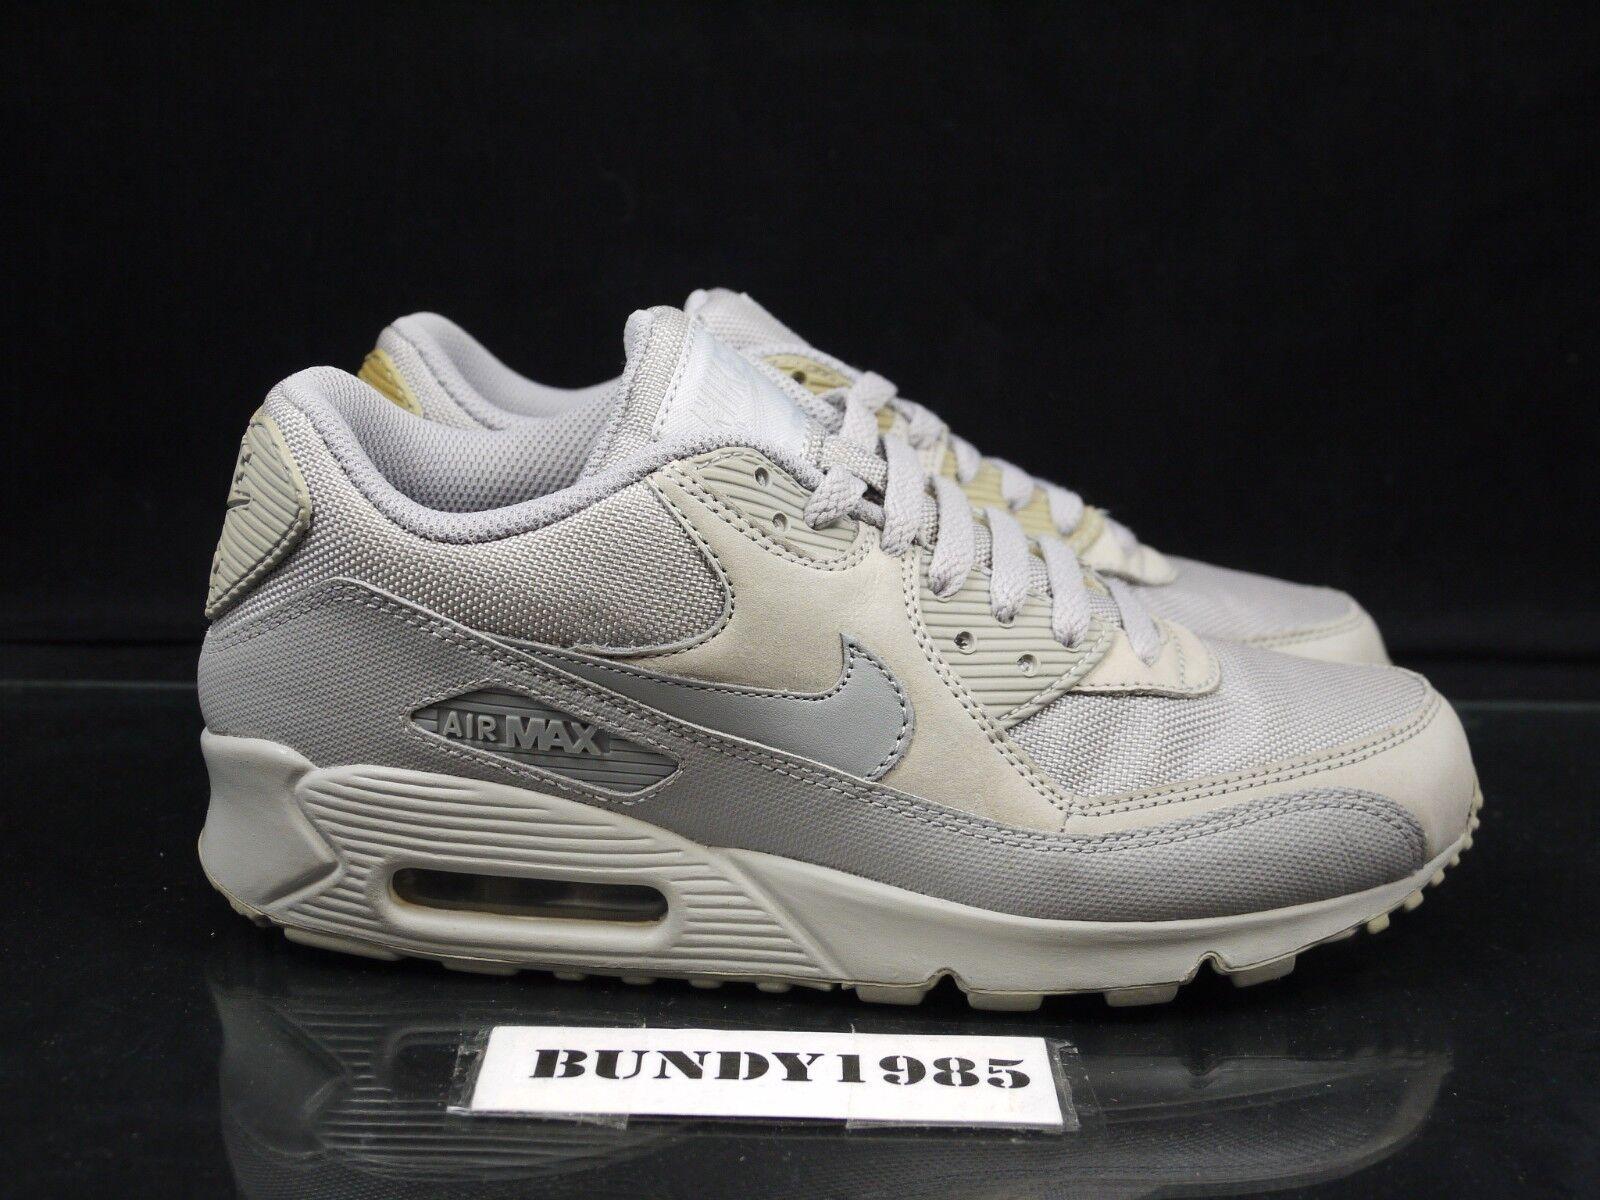 (P) 333888 002 Nike Air Max 90 Medio gris De De De Hombre Talla 8  Obtén lo ultimo